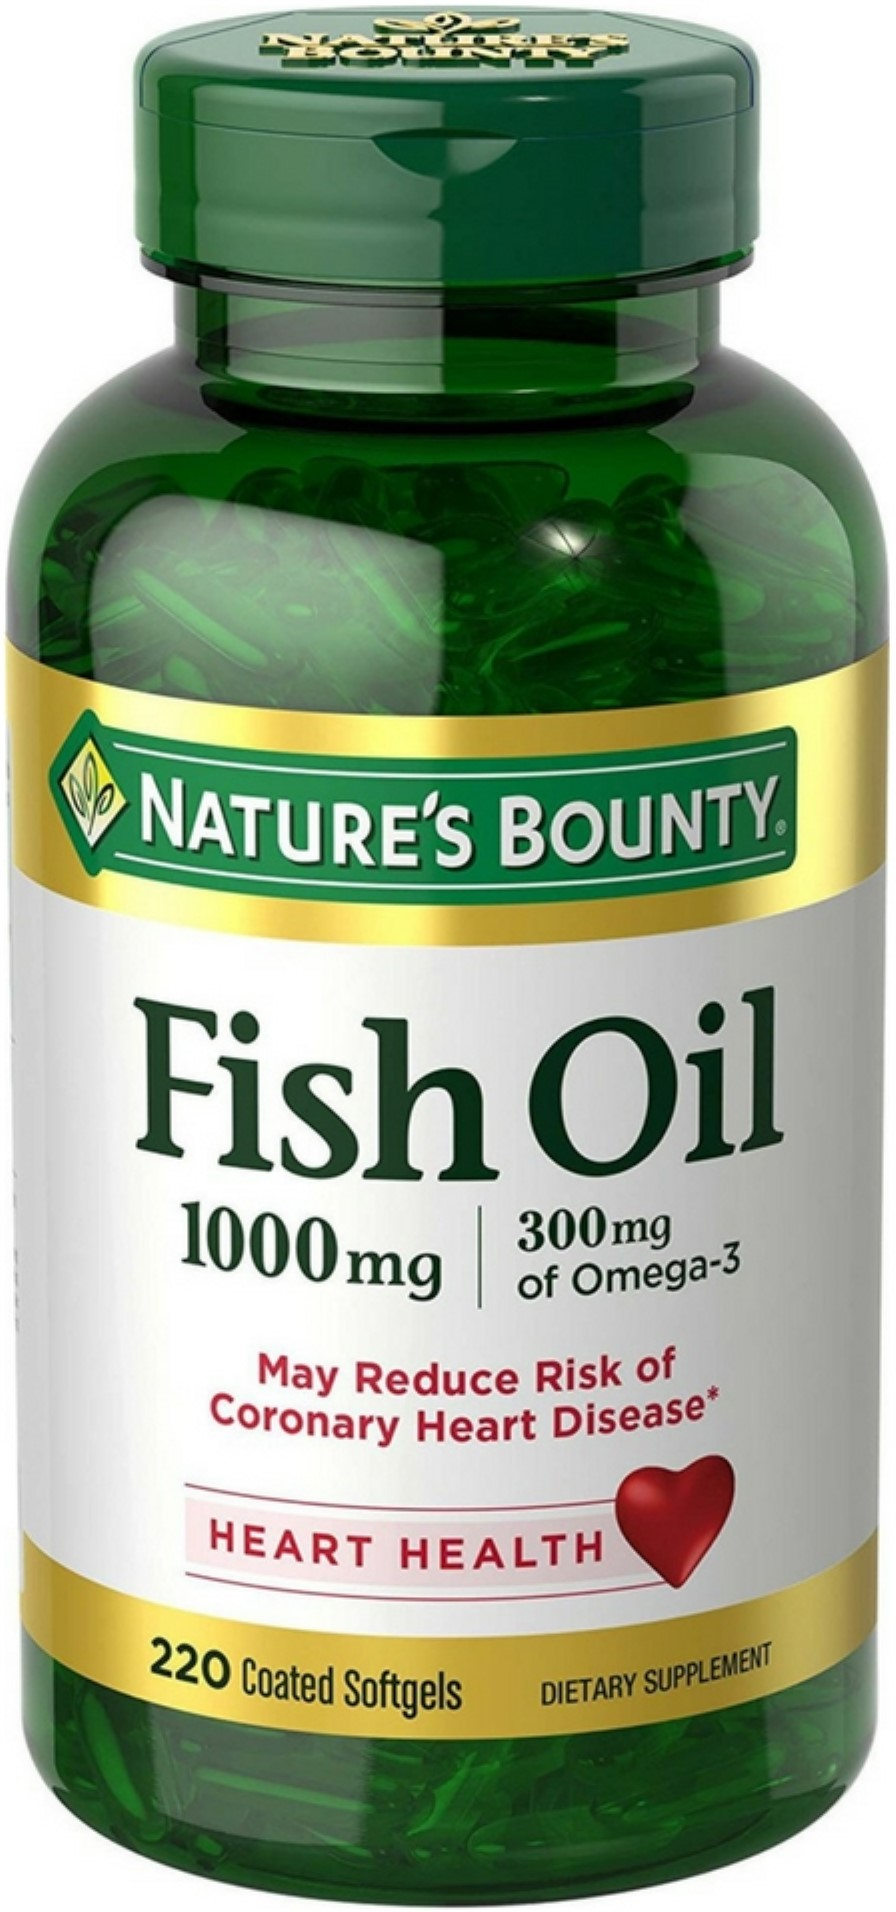 omega fish oil bounty nature mg 1000 walmart